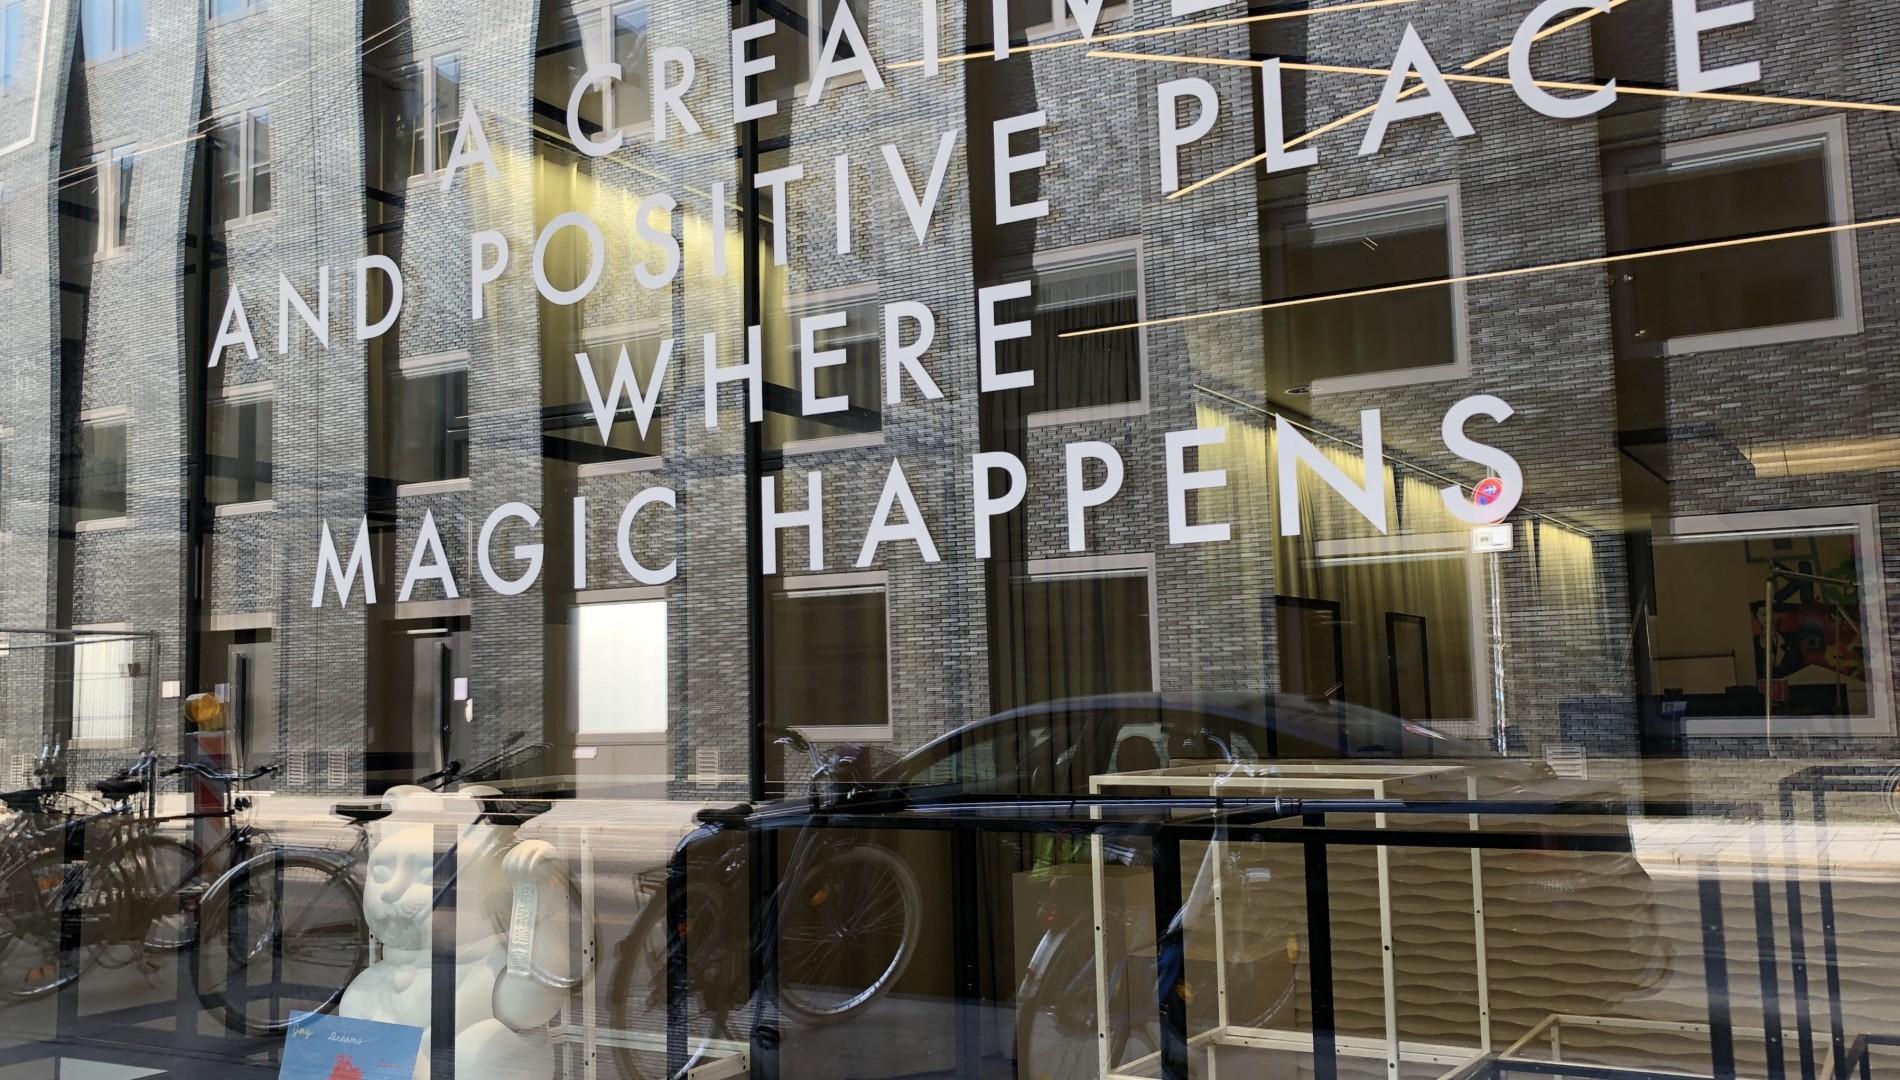 Büro der Designagentur das formt in München - Creative and positive place where magic happens.